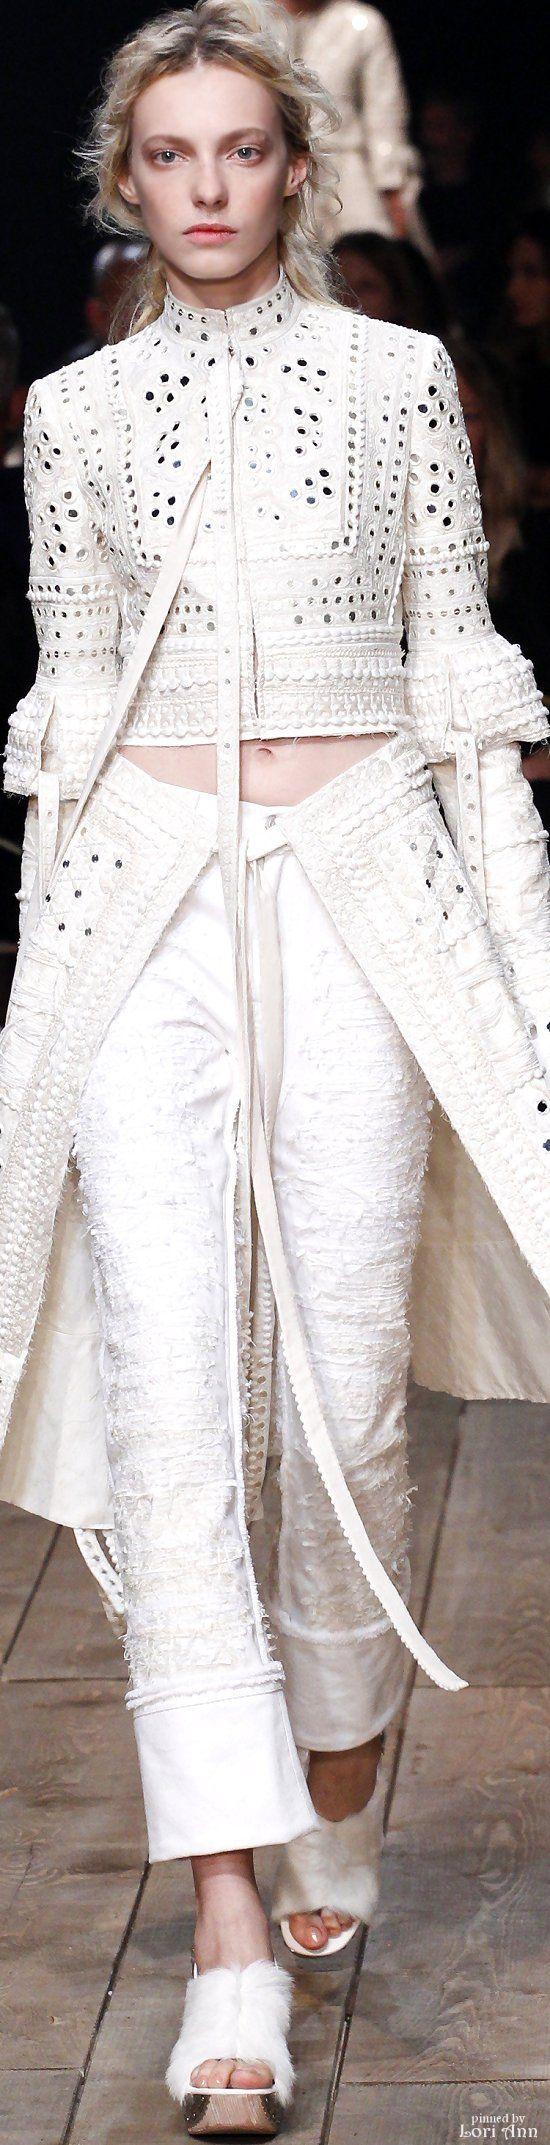 Alexander McQueen         Spring 2016.         Ready To Wear